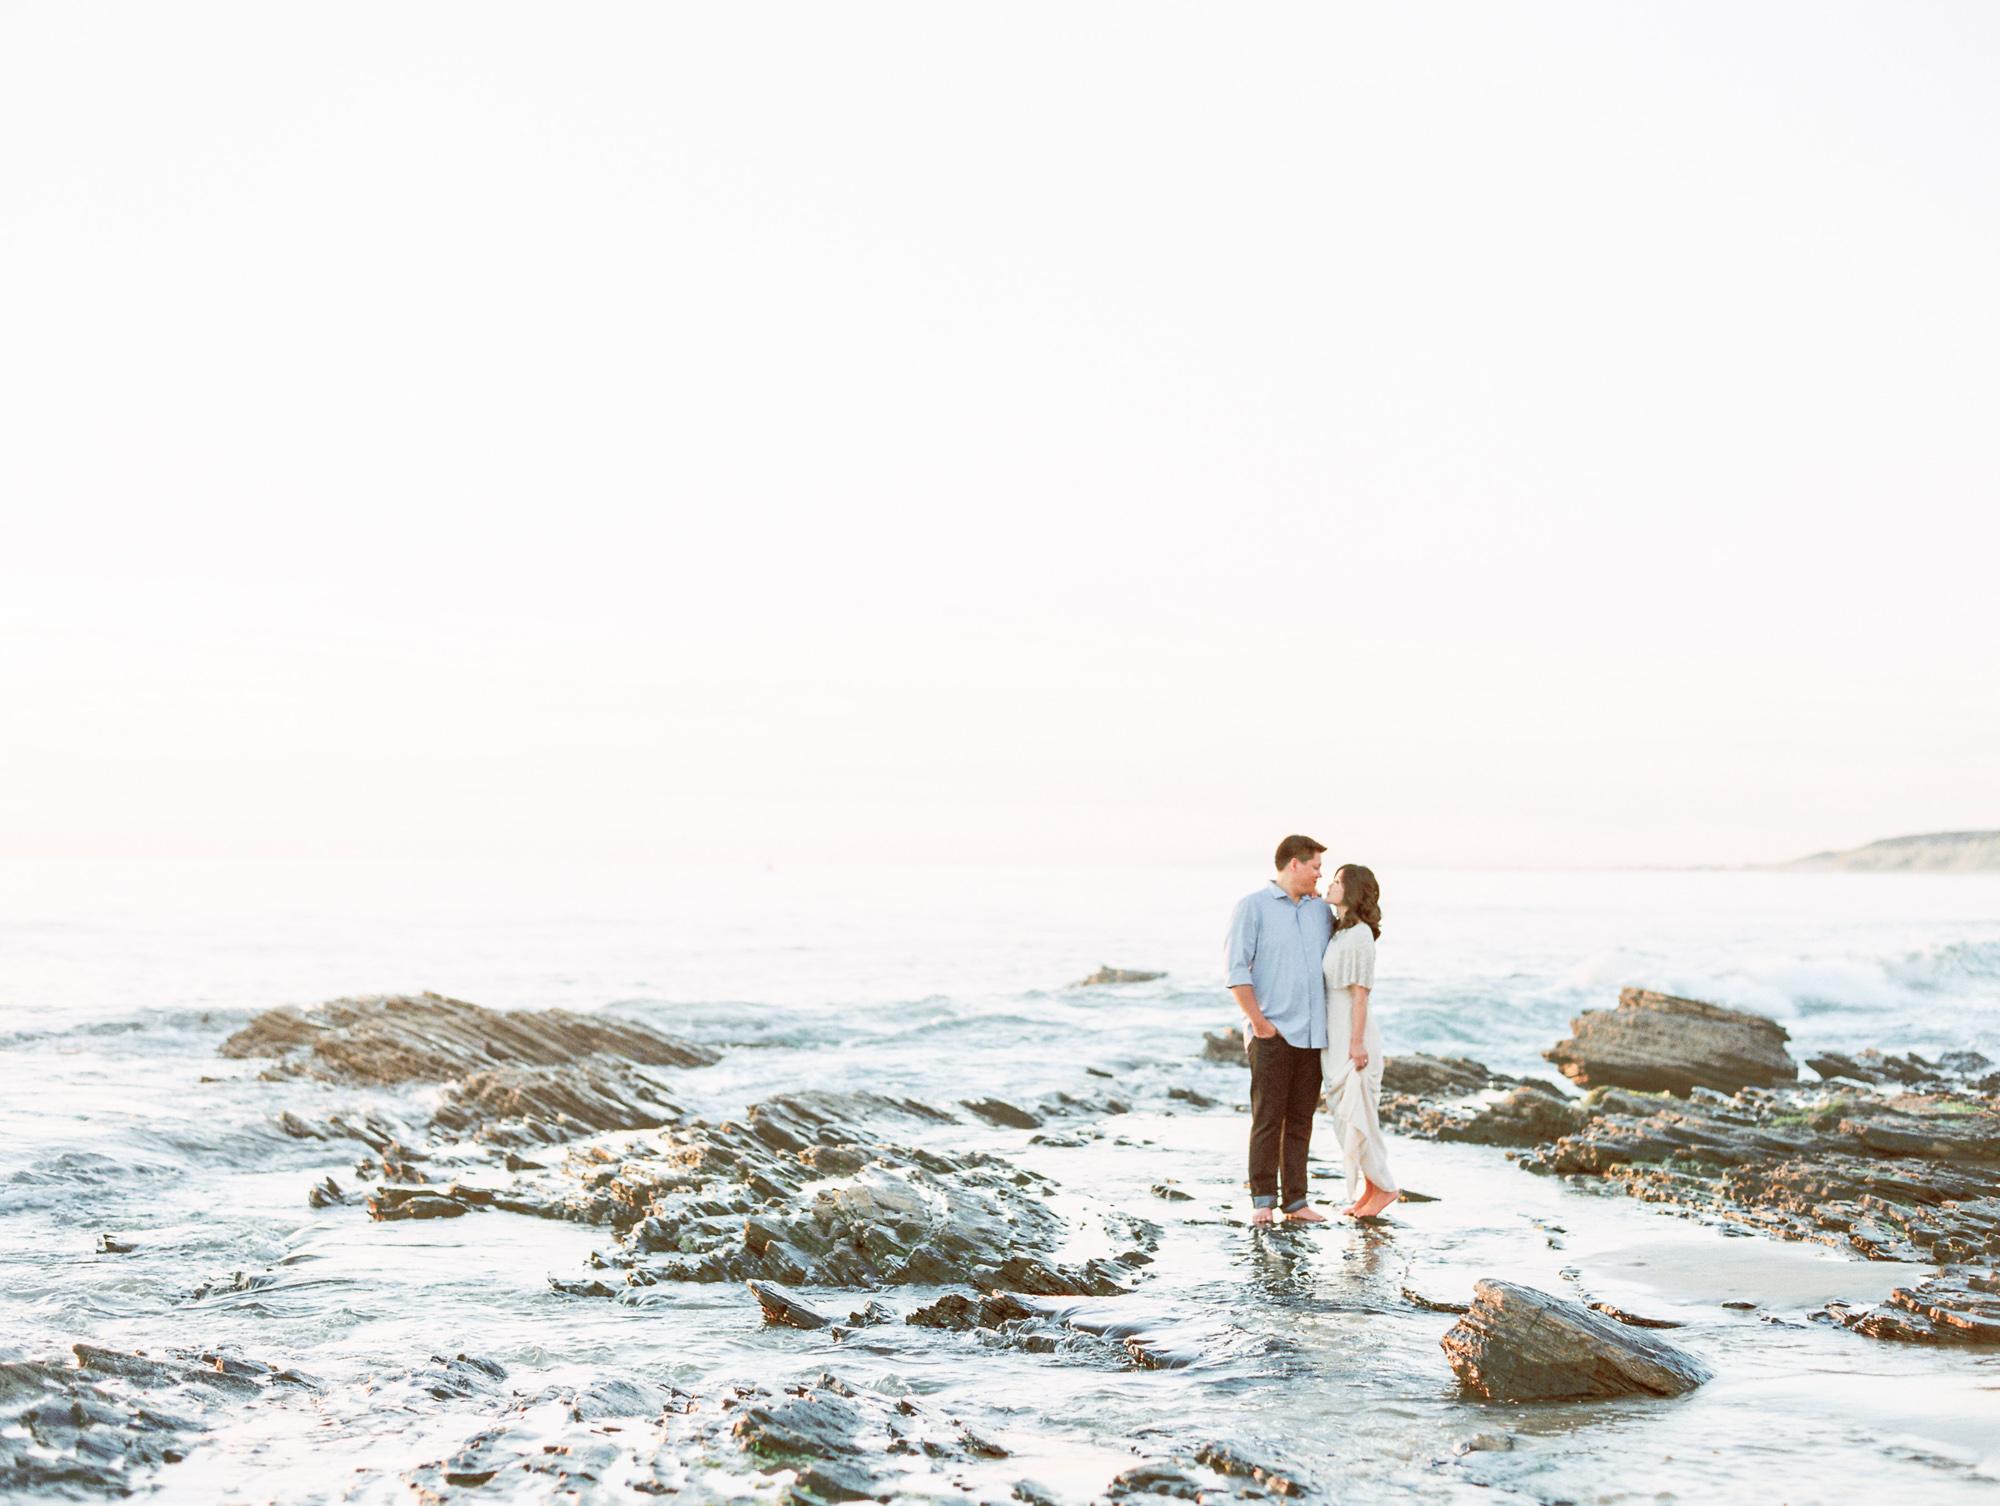 Crystal-Cove-Engagement-Kristina-Adams-20.jpg